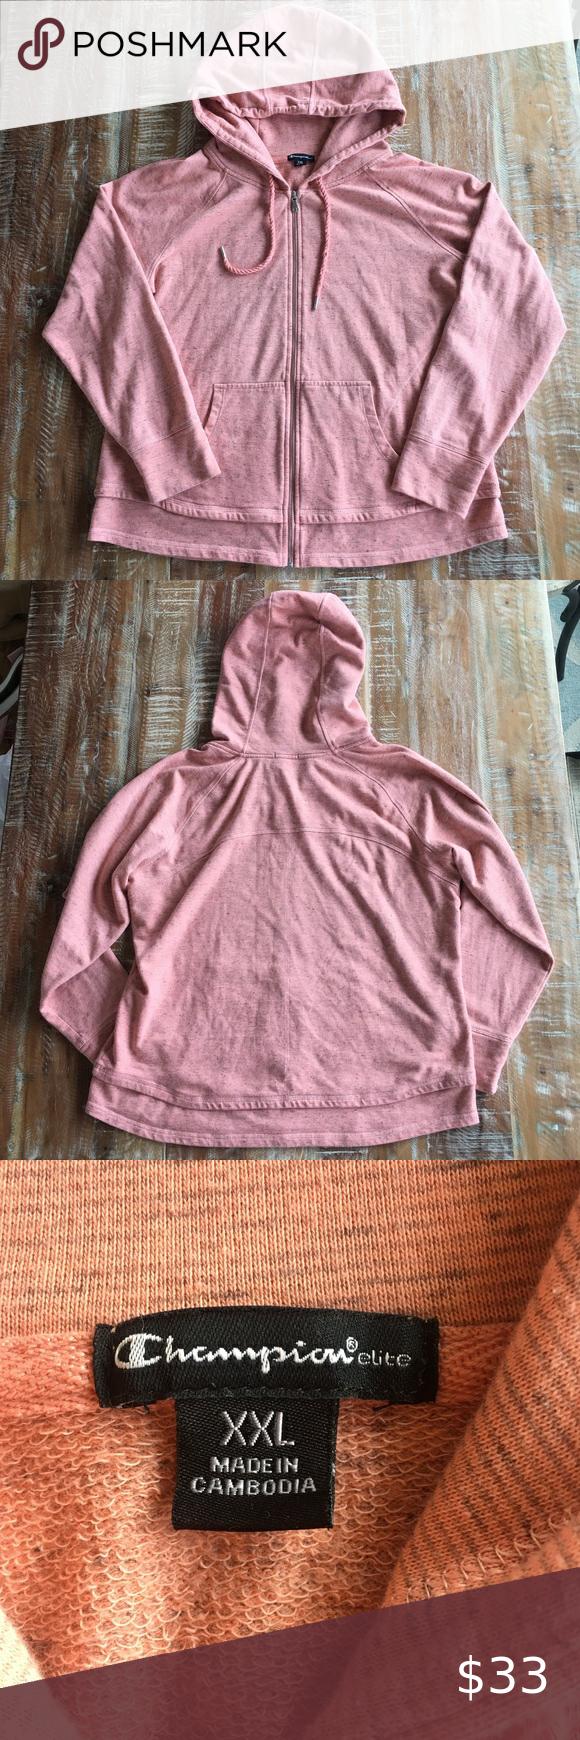 Champion Elite French Terry Full Zip Hoodie Jacket In 2021 Full Zip Hoodie Pink Champion Hoodie Hoodie Jacket [ 1740 x 580 Pixel ]